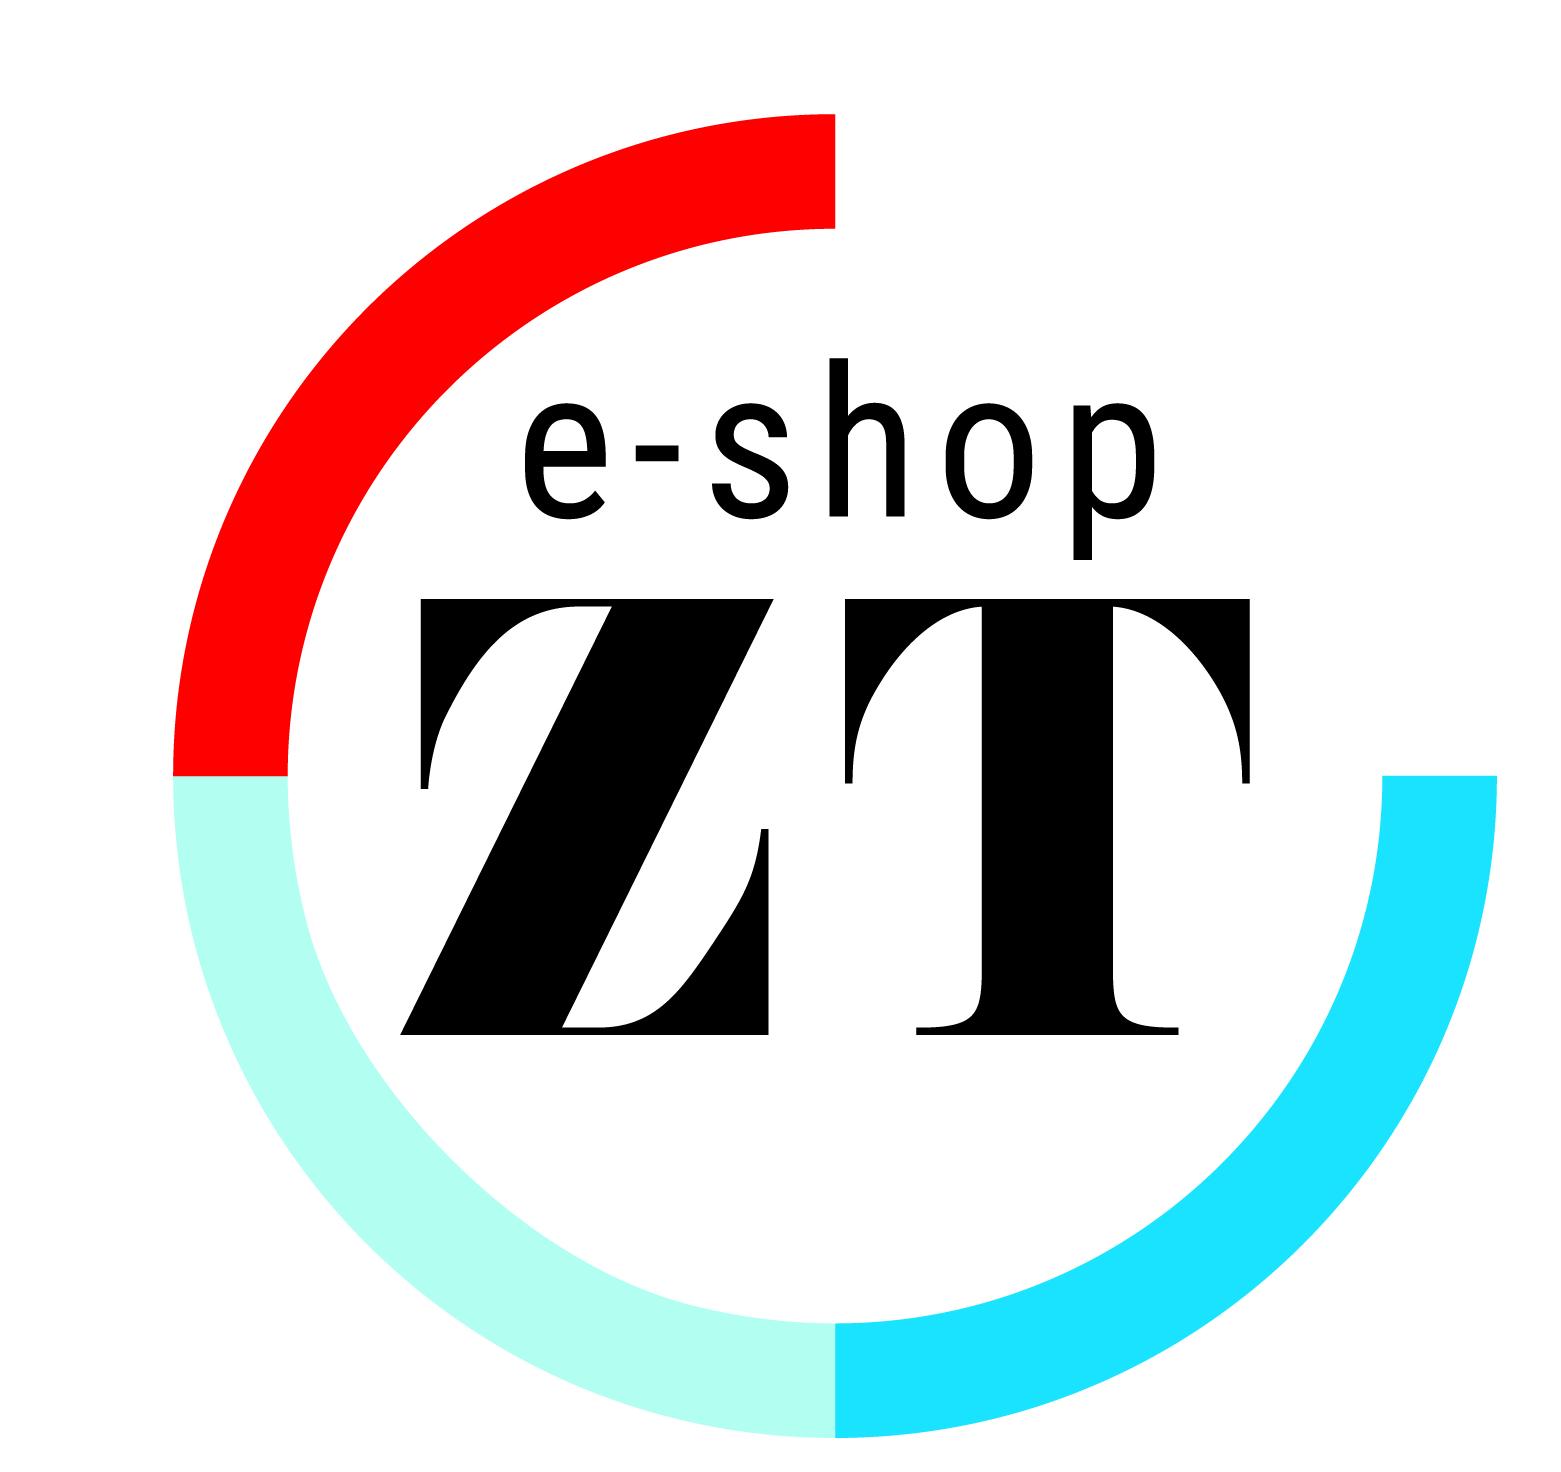 e-shop ZT